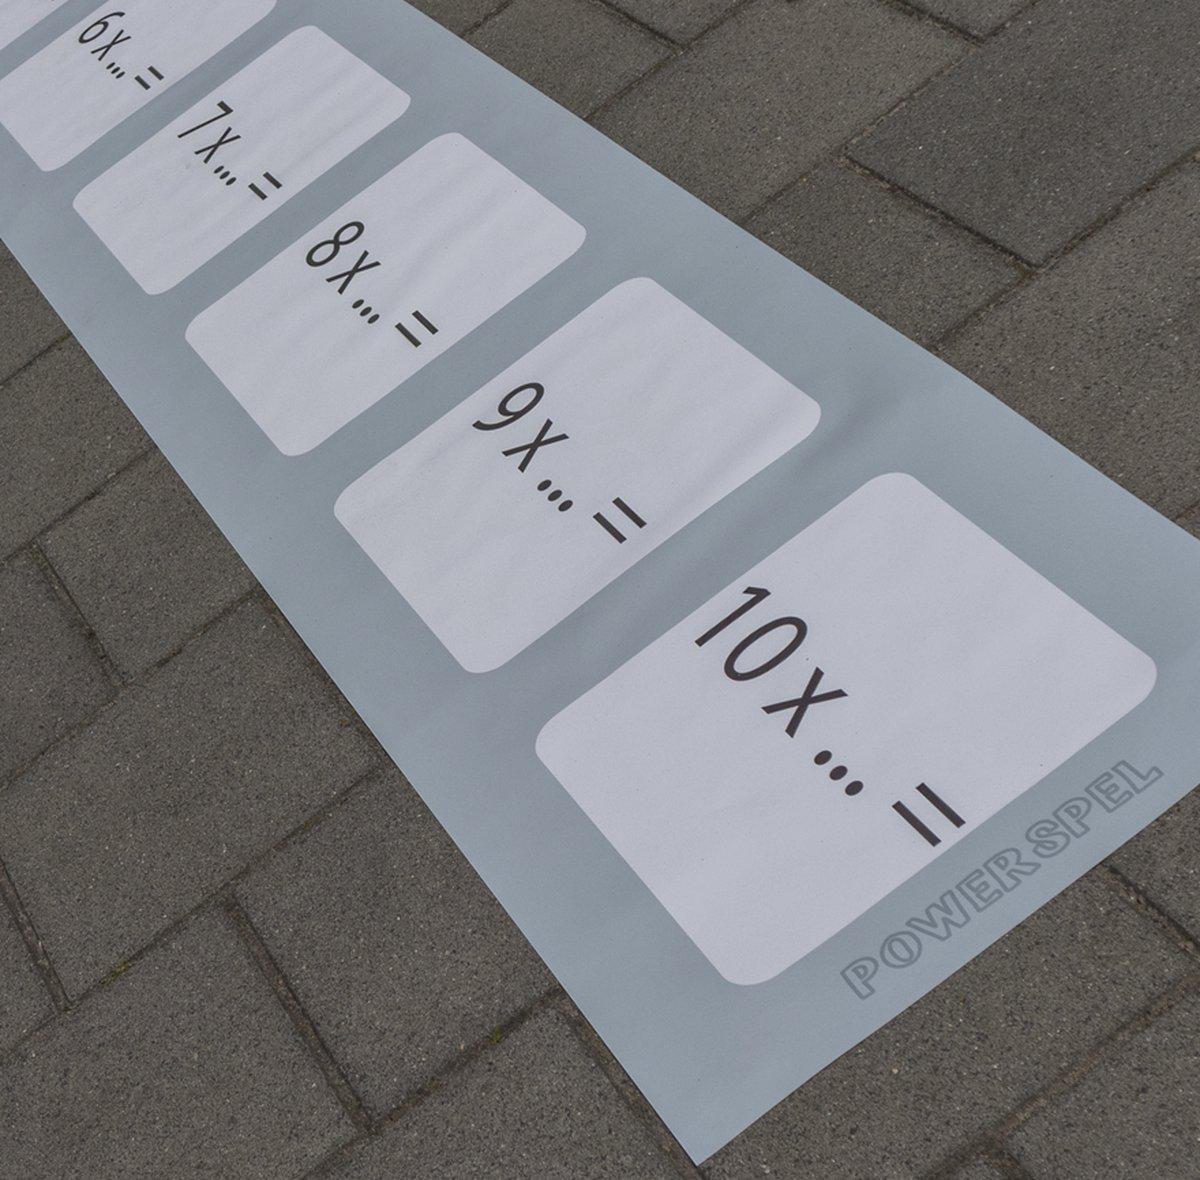 Leermat tafels (lengte)